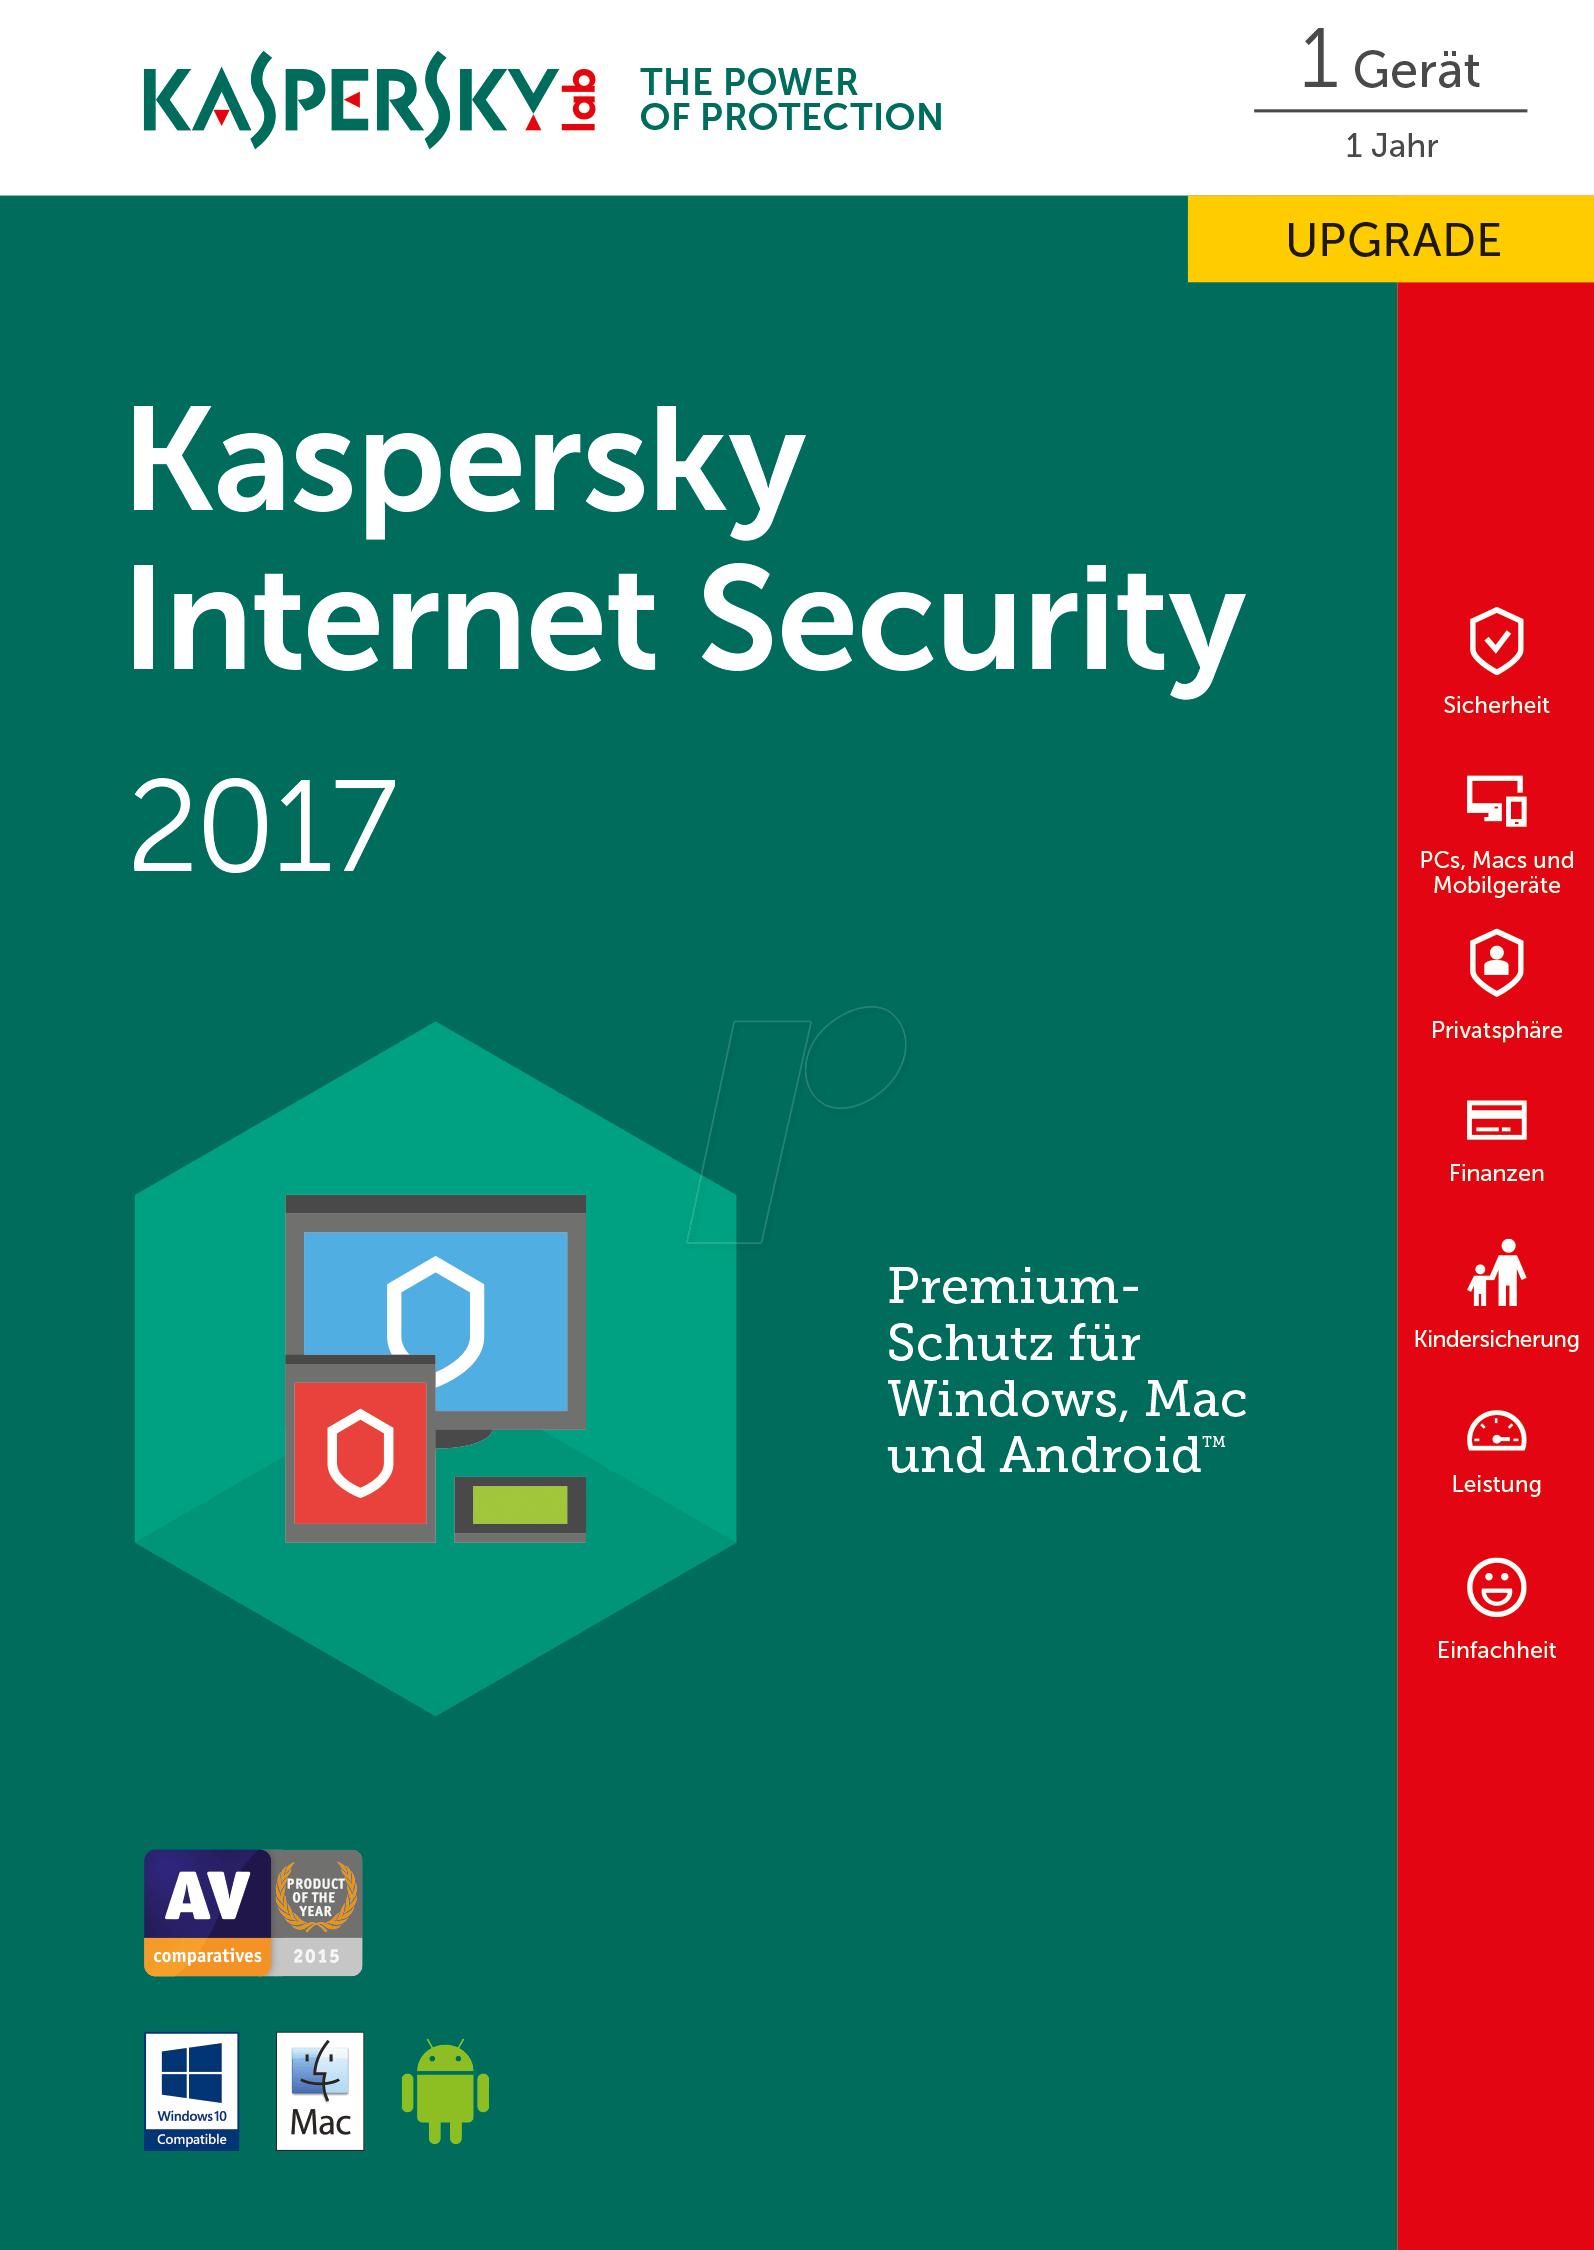 https://cdn-reichelt.de/bilder/web/xxl_ws/G500/KASPERSKY_IS2017_UPG_02.png